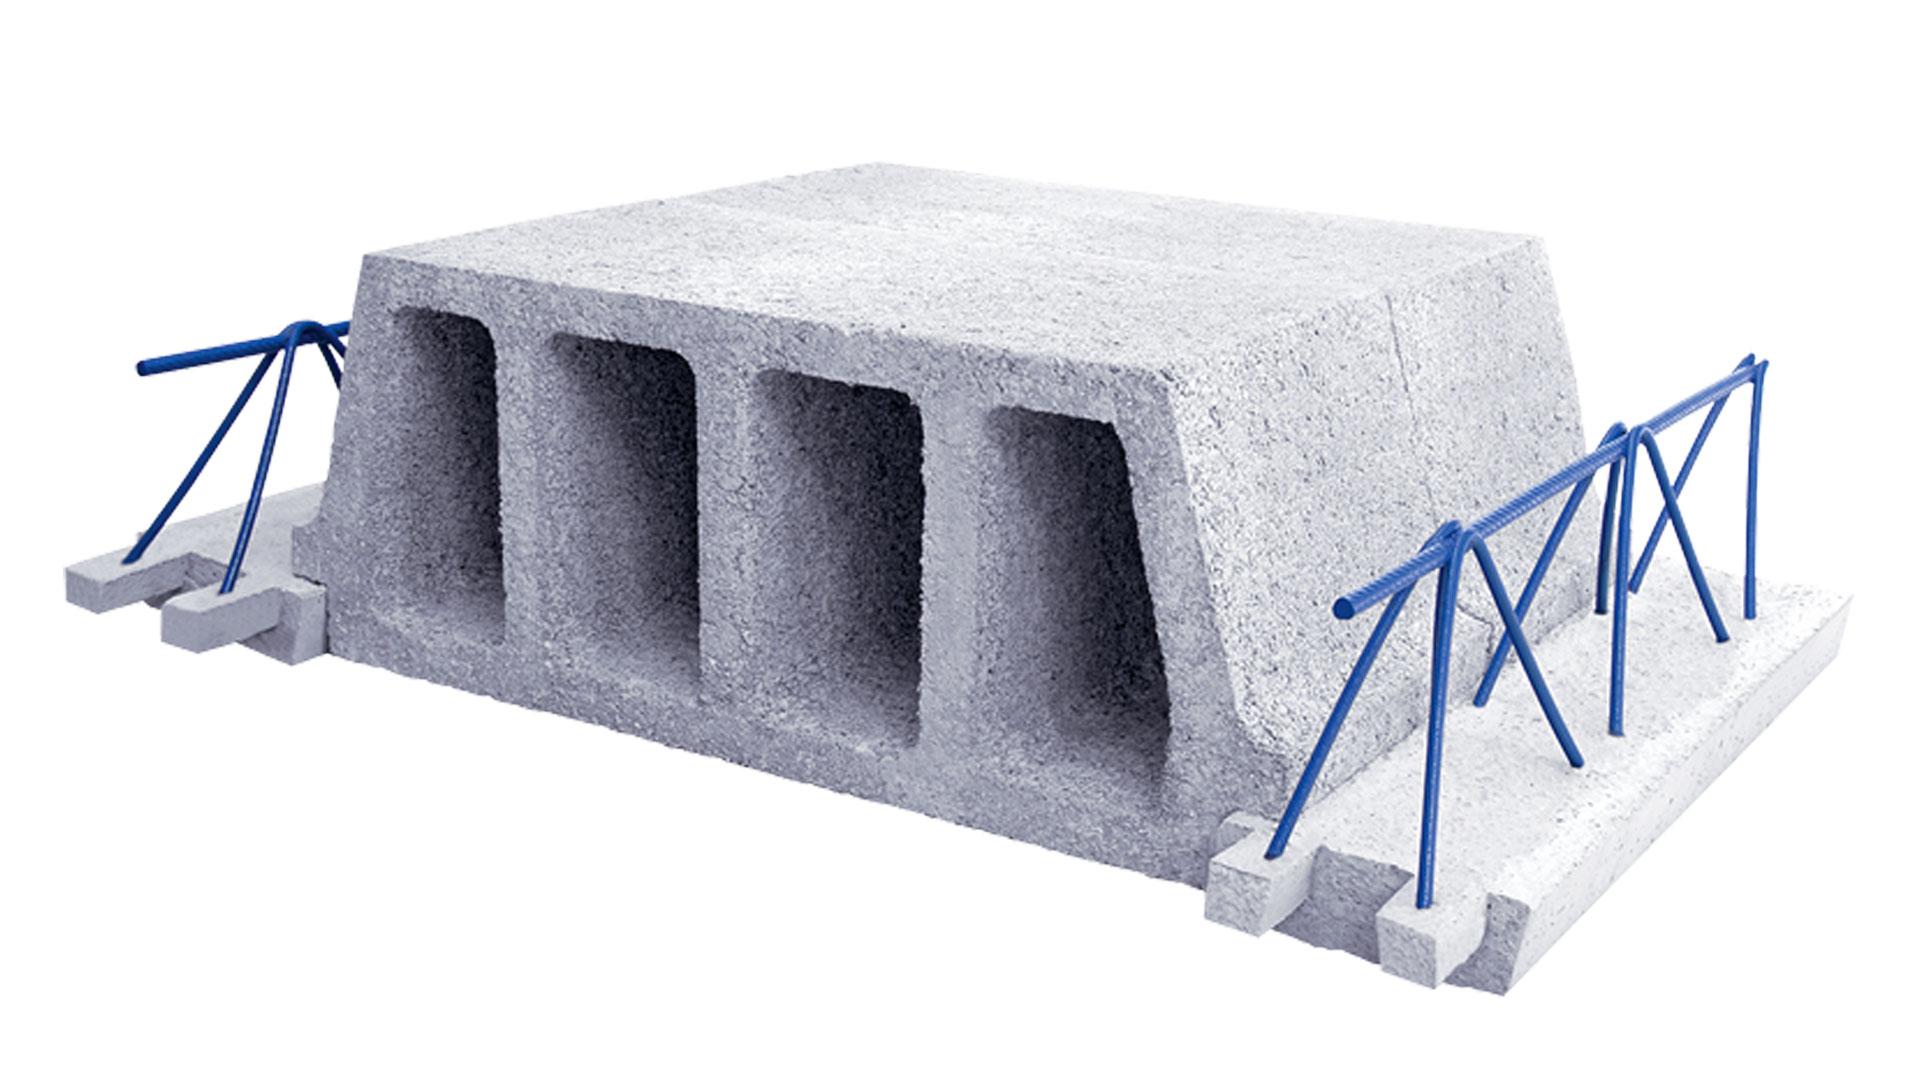 prescot-stop-betonove-stropne-systemy